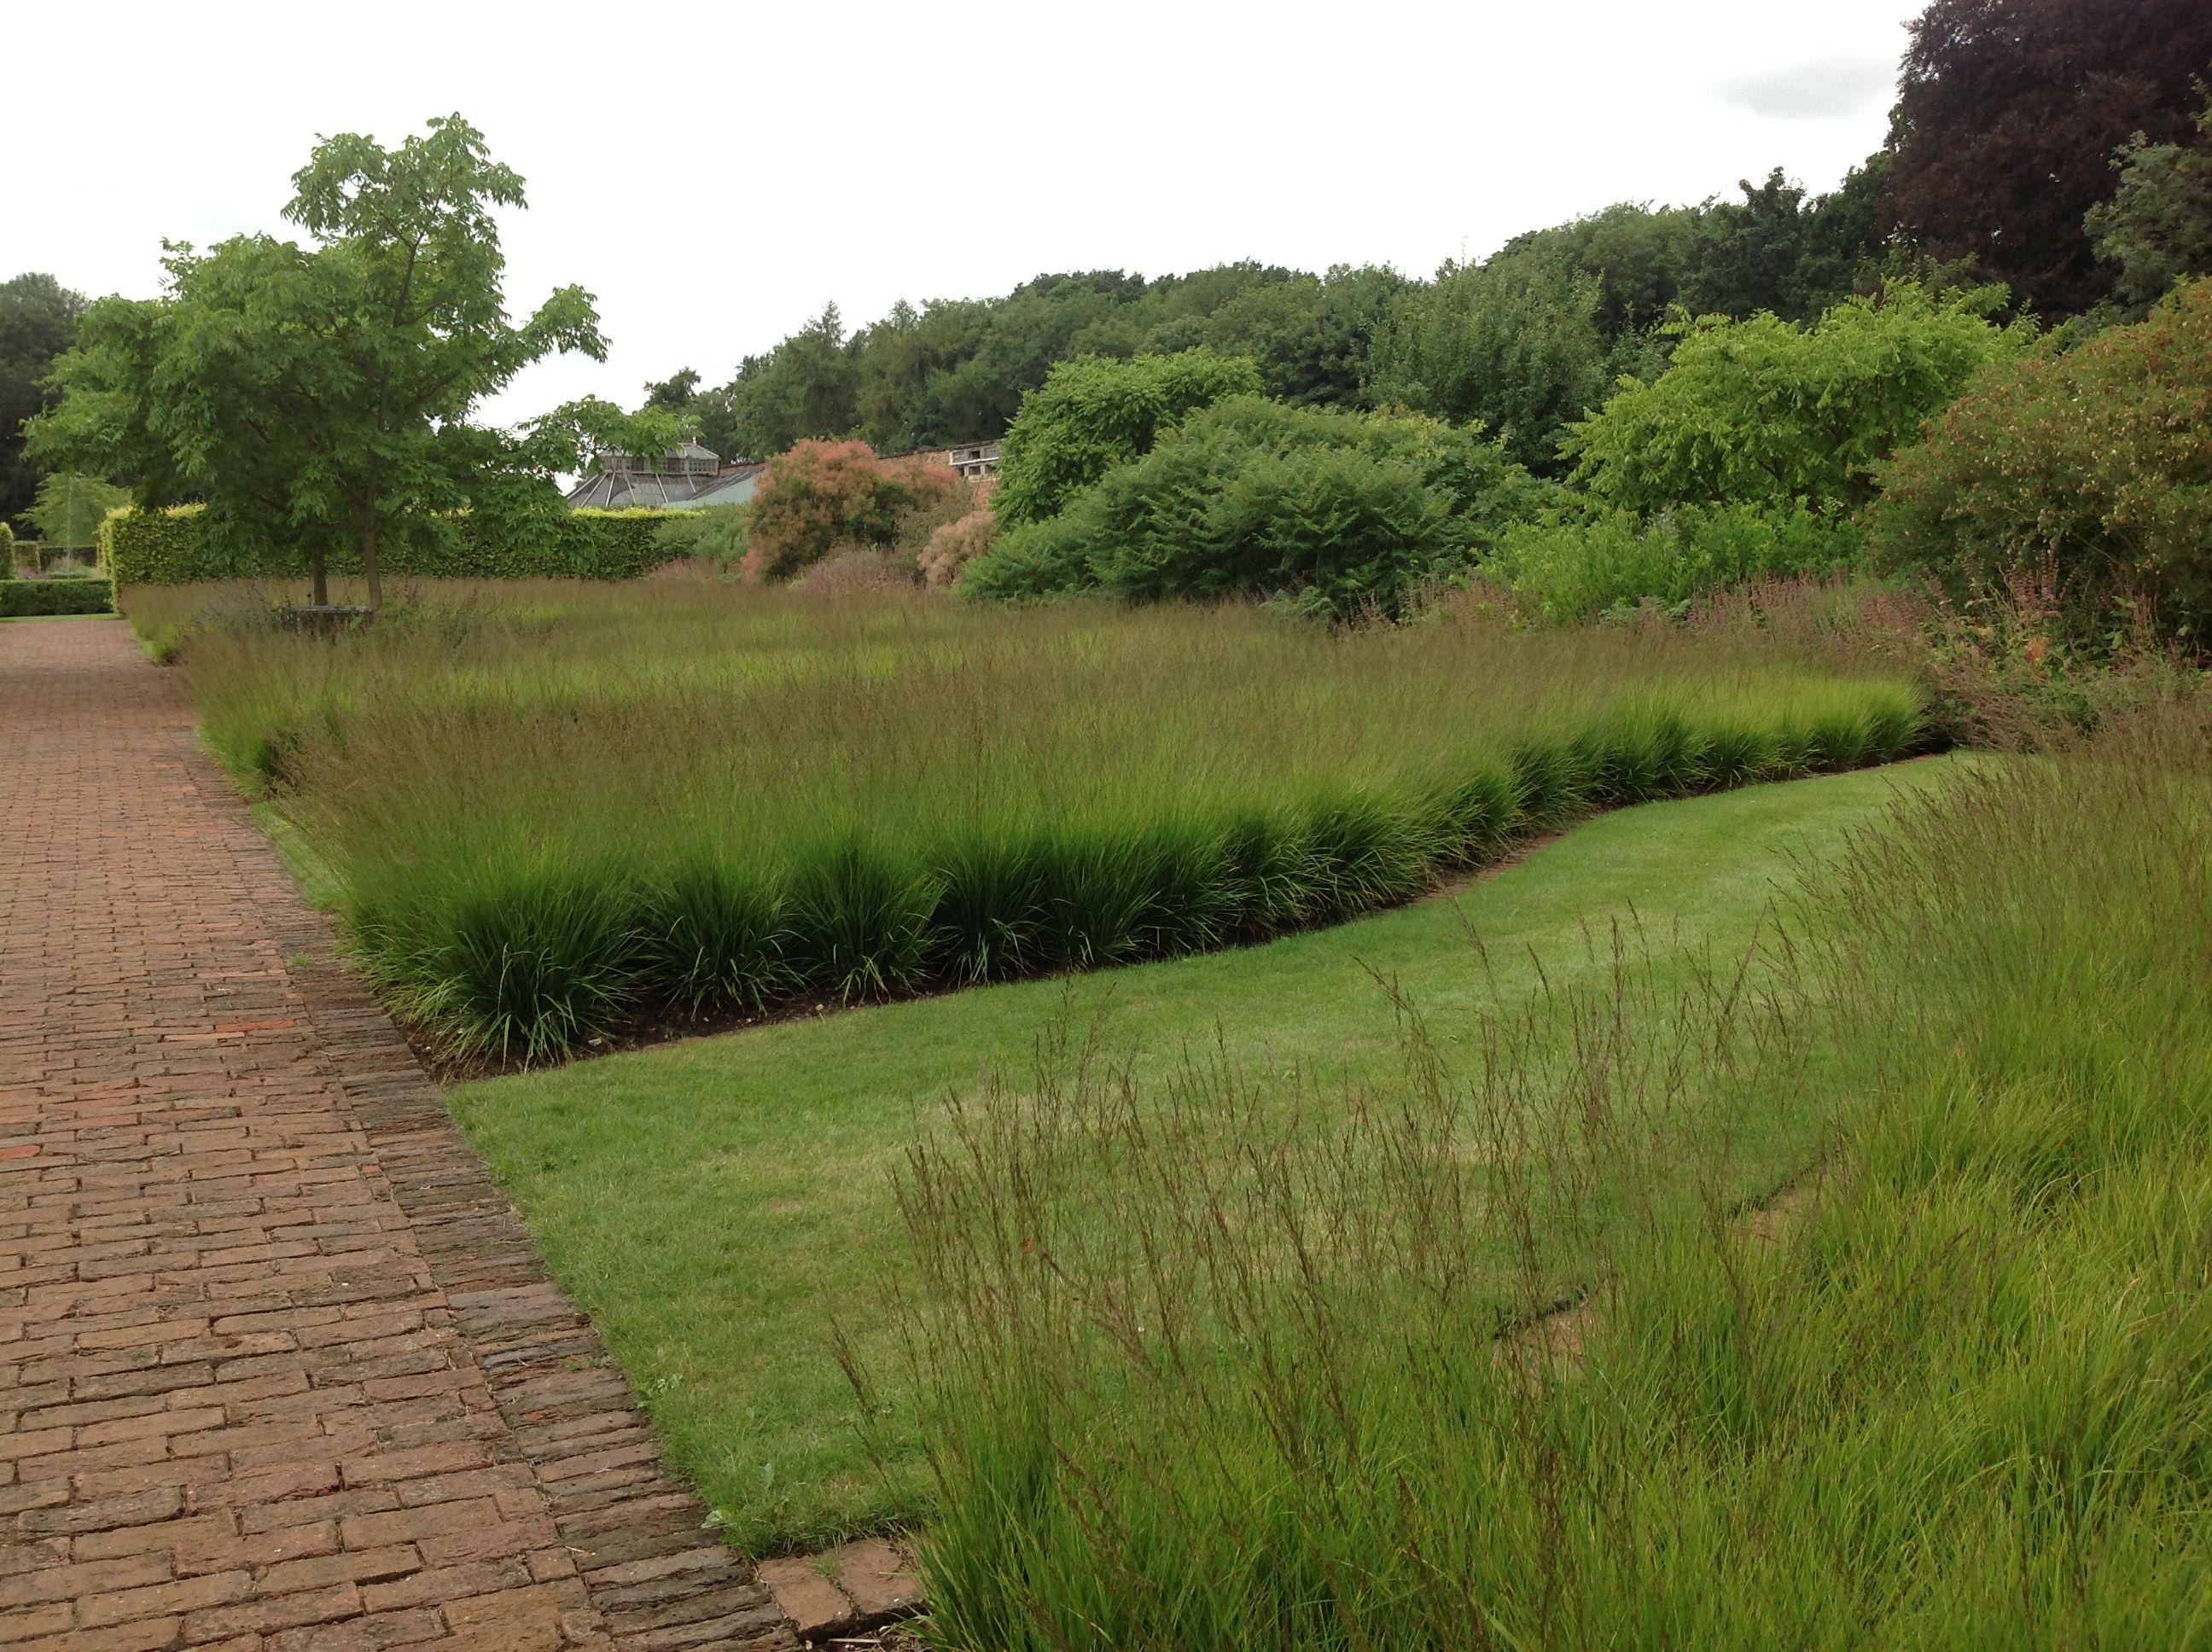 Piet Oudolf | Landscape design, Garden design, Plant design